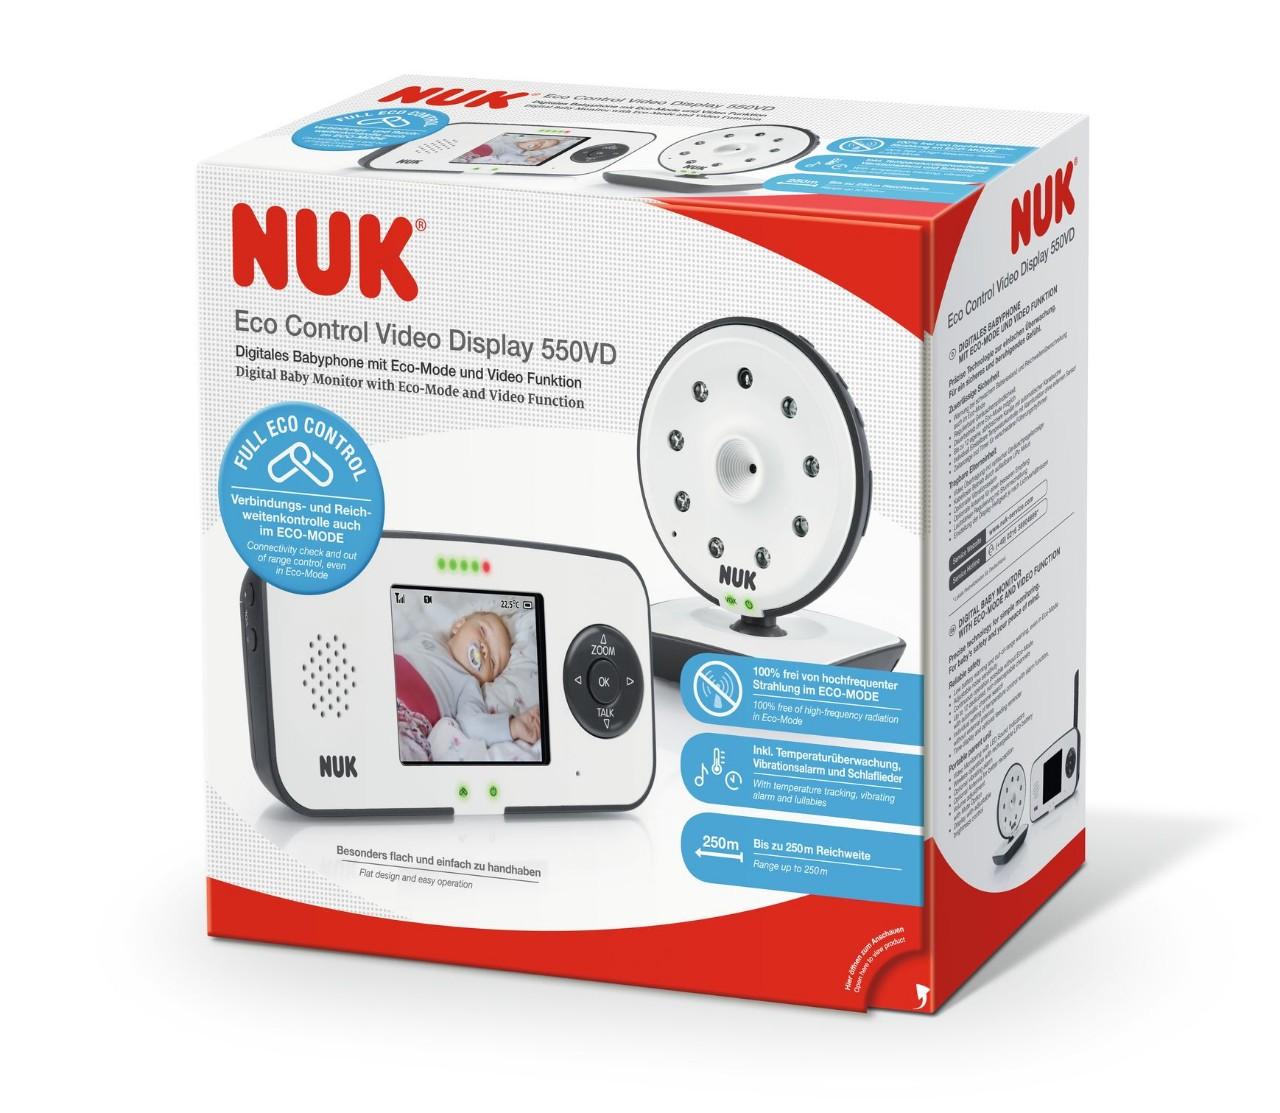 NUK Eco Control Video Display 550VD